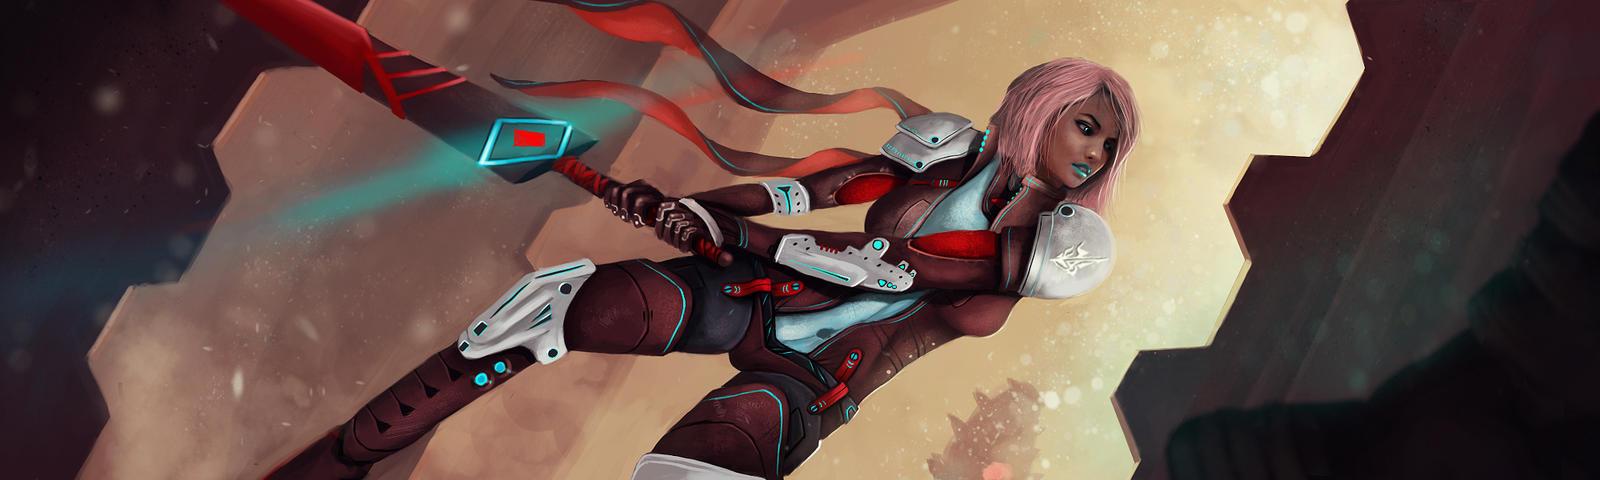 Red Savior by SephOo